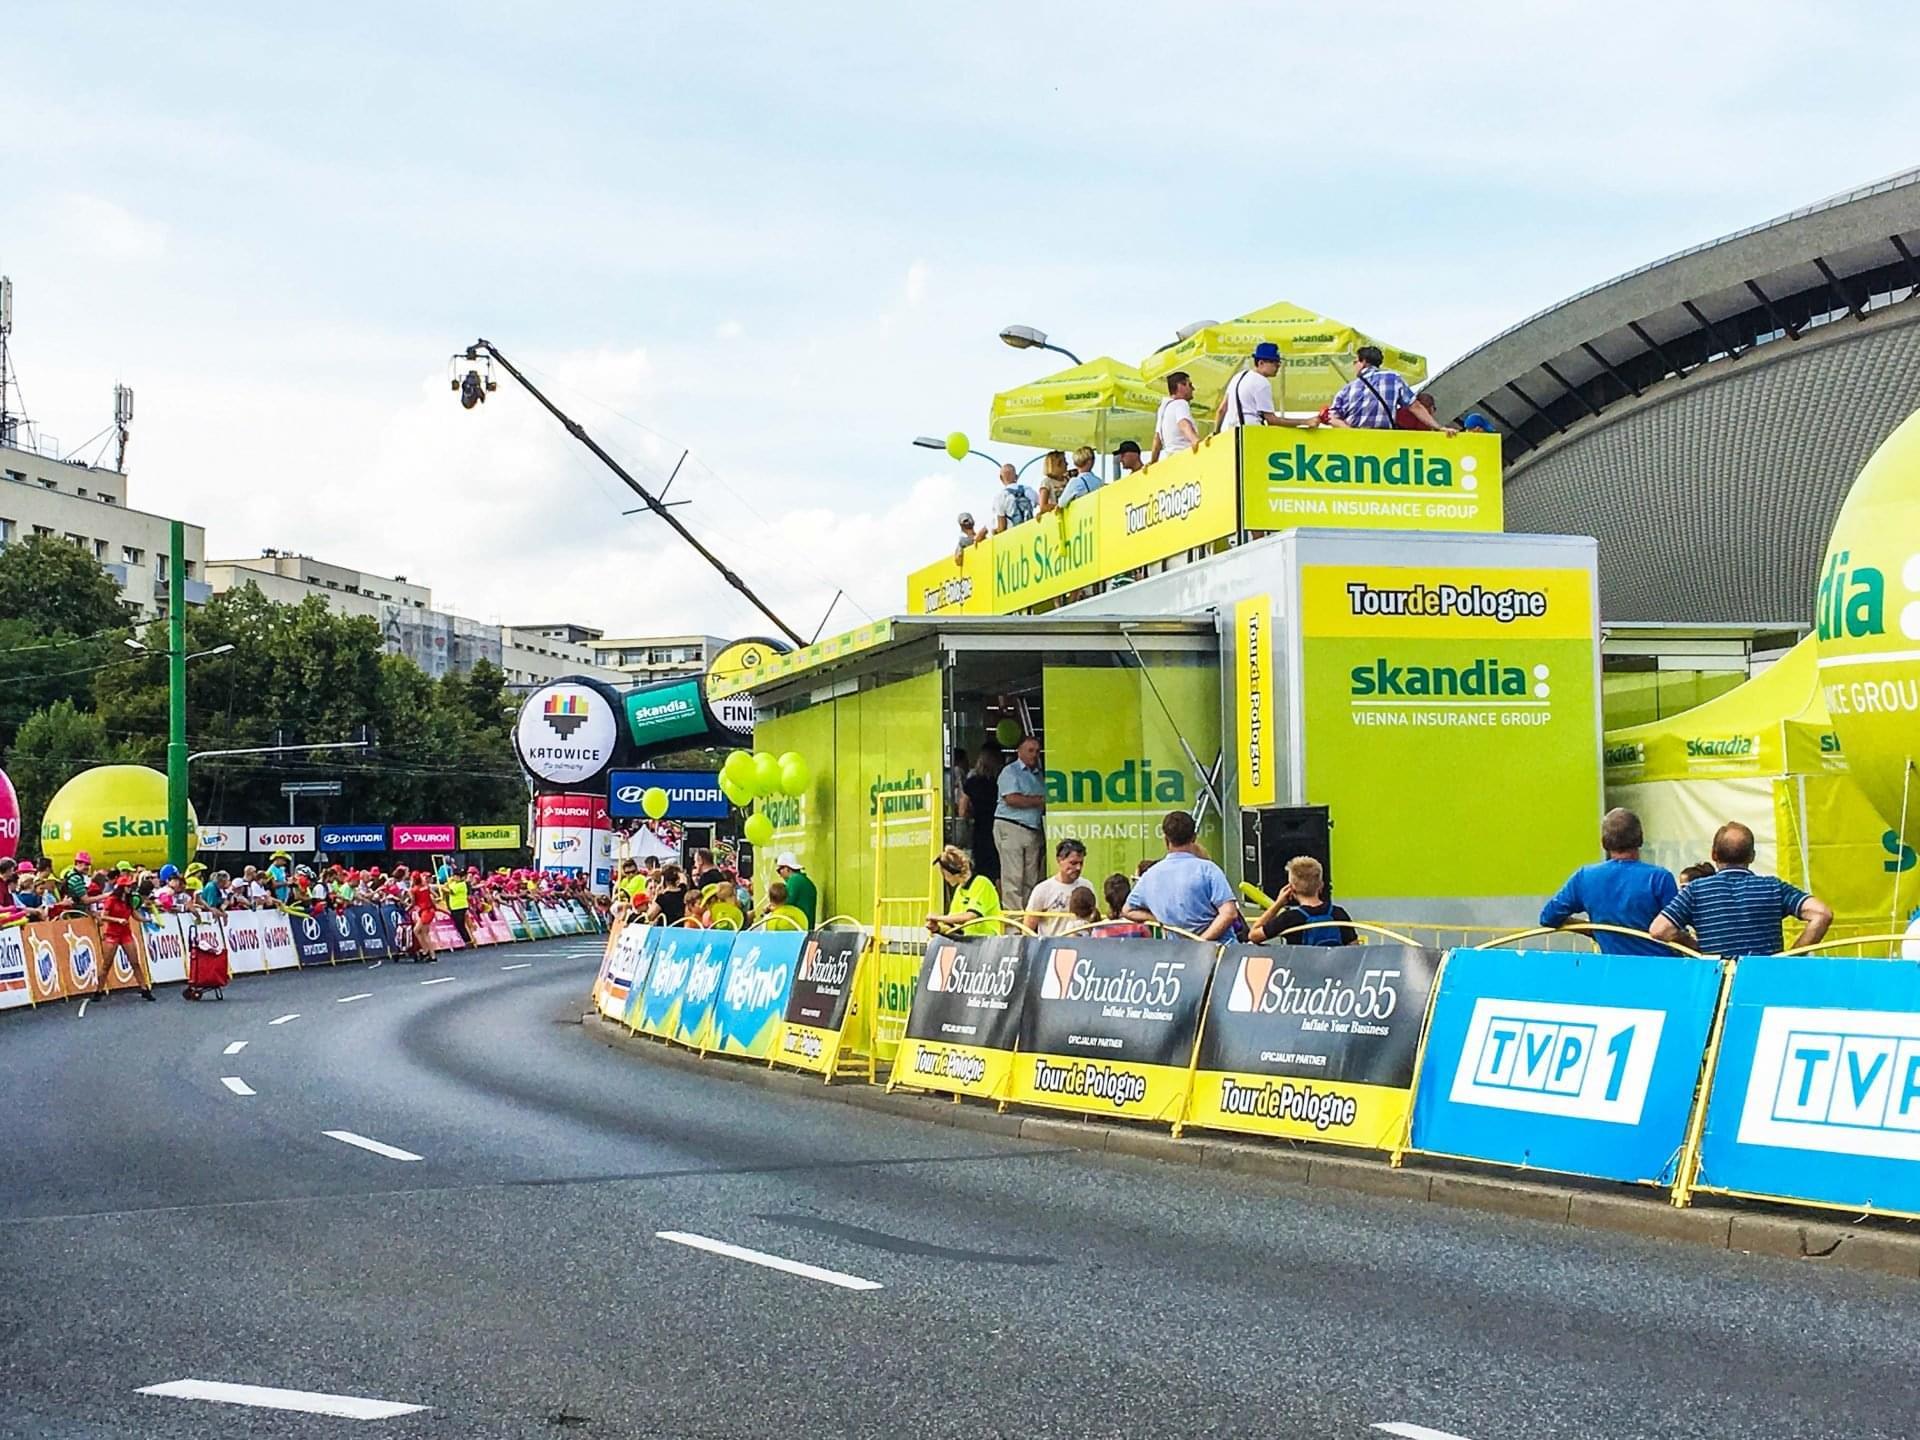 73 Tour de Pologne main sponsor hospitality Unit